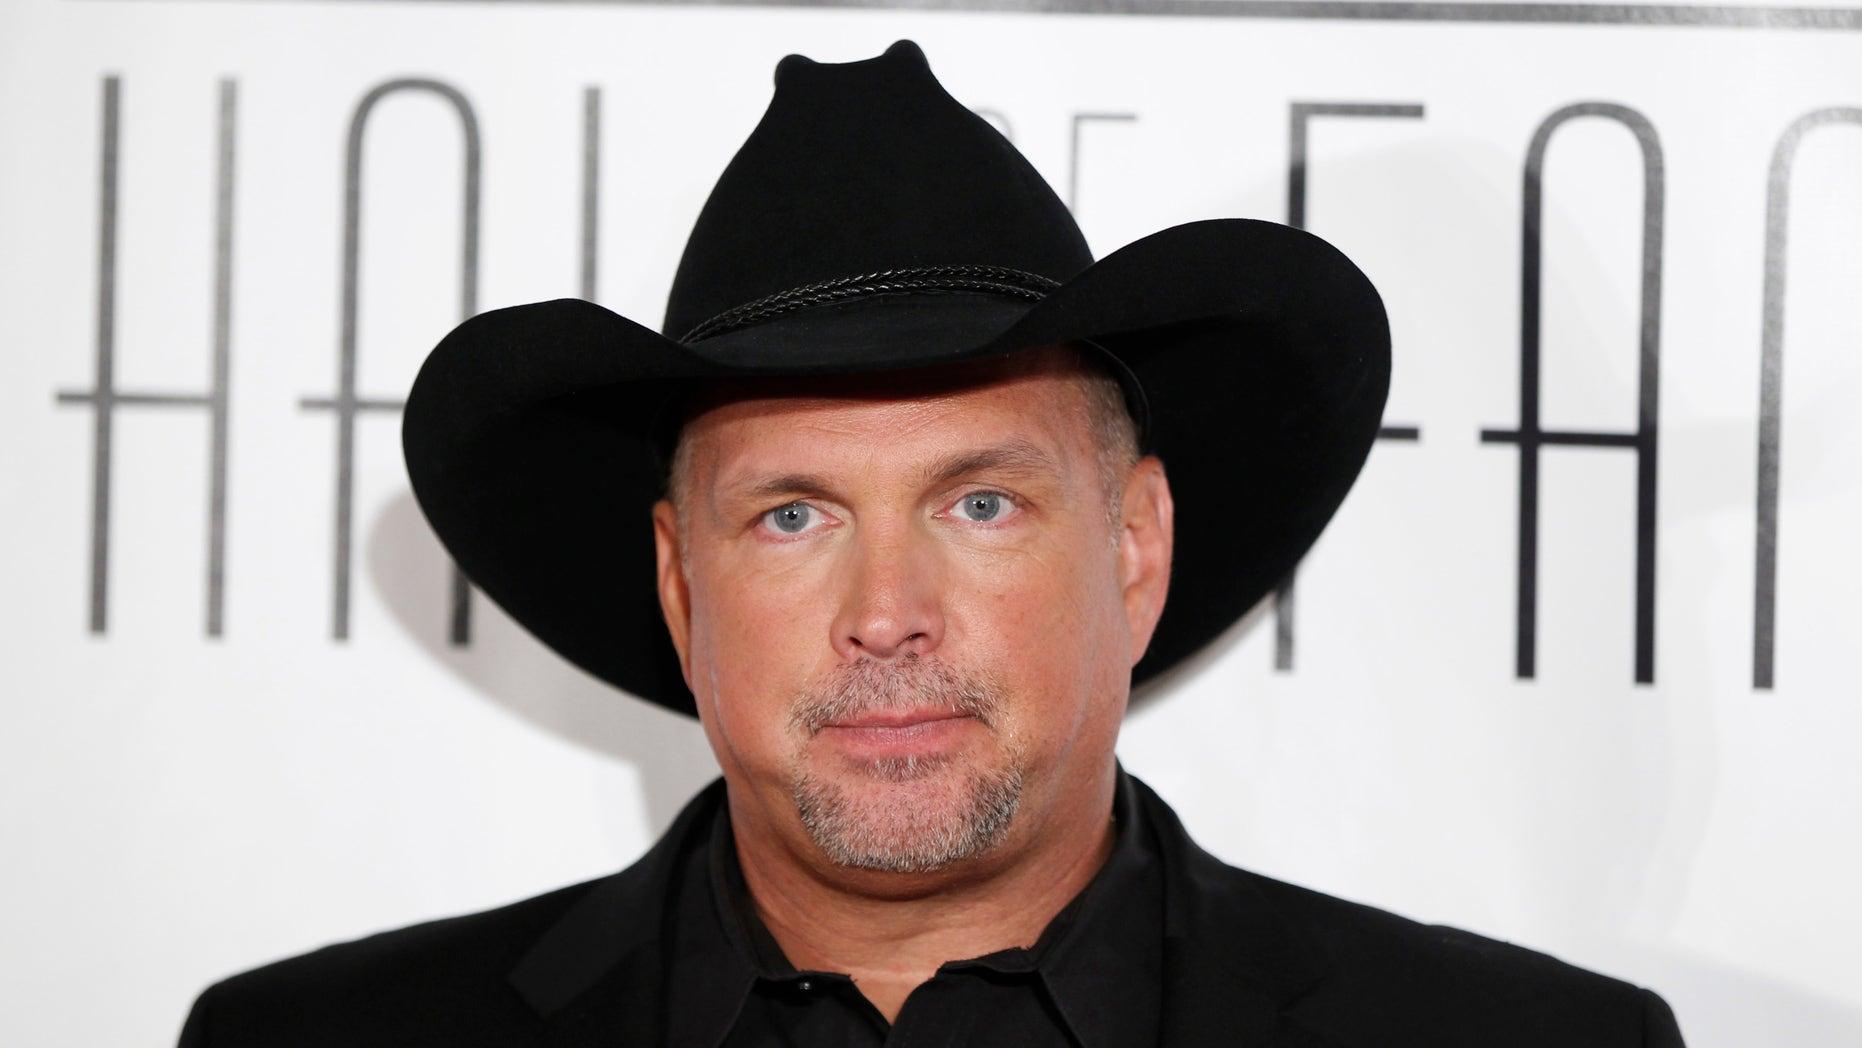 June 16, 2011. Singer Garth Brooks arrives for the Songwriters Hall of Fame awards in New York.